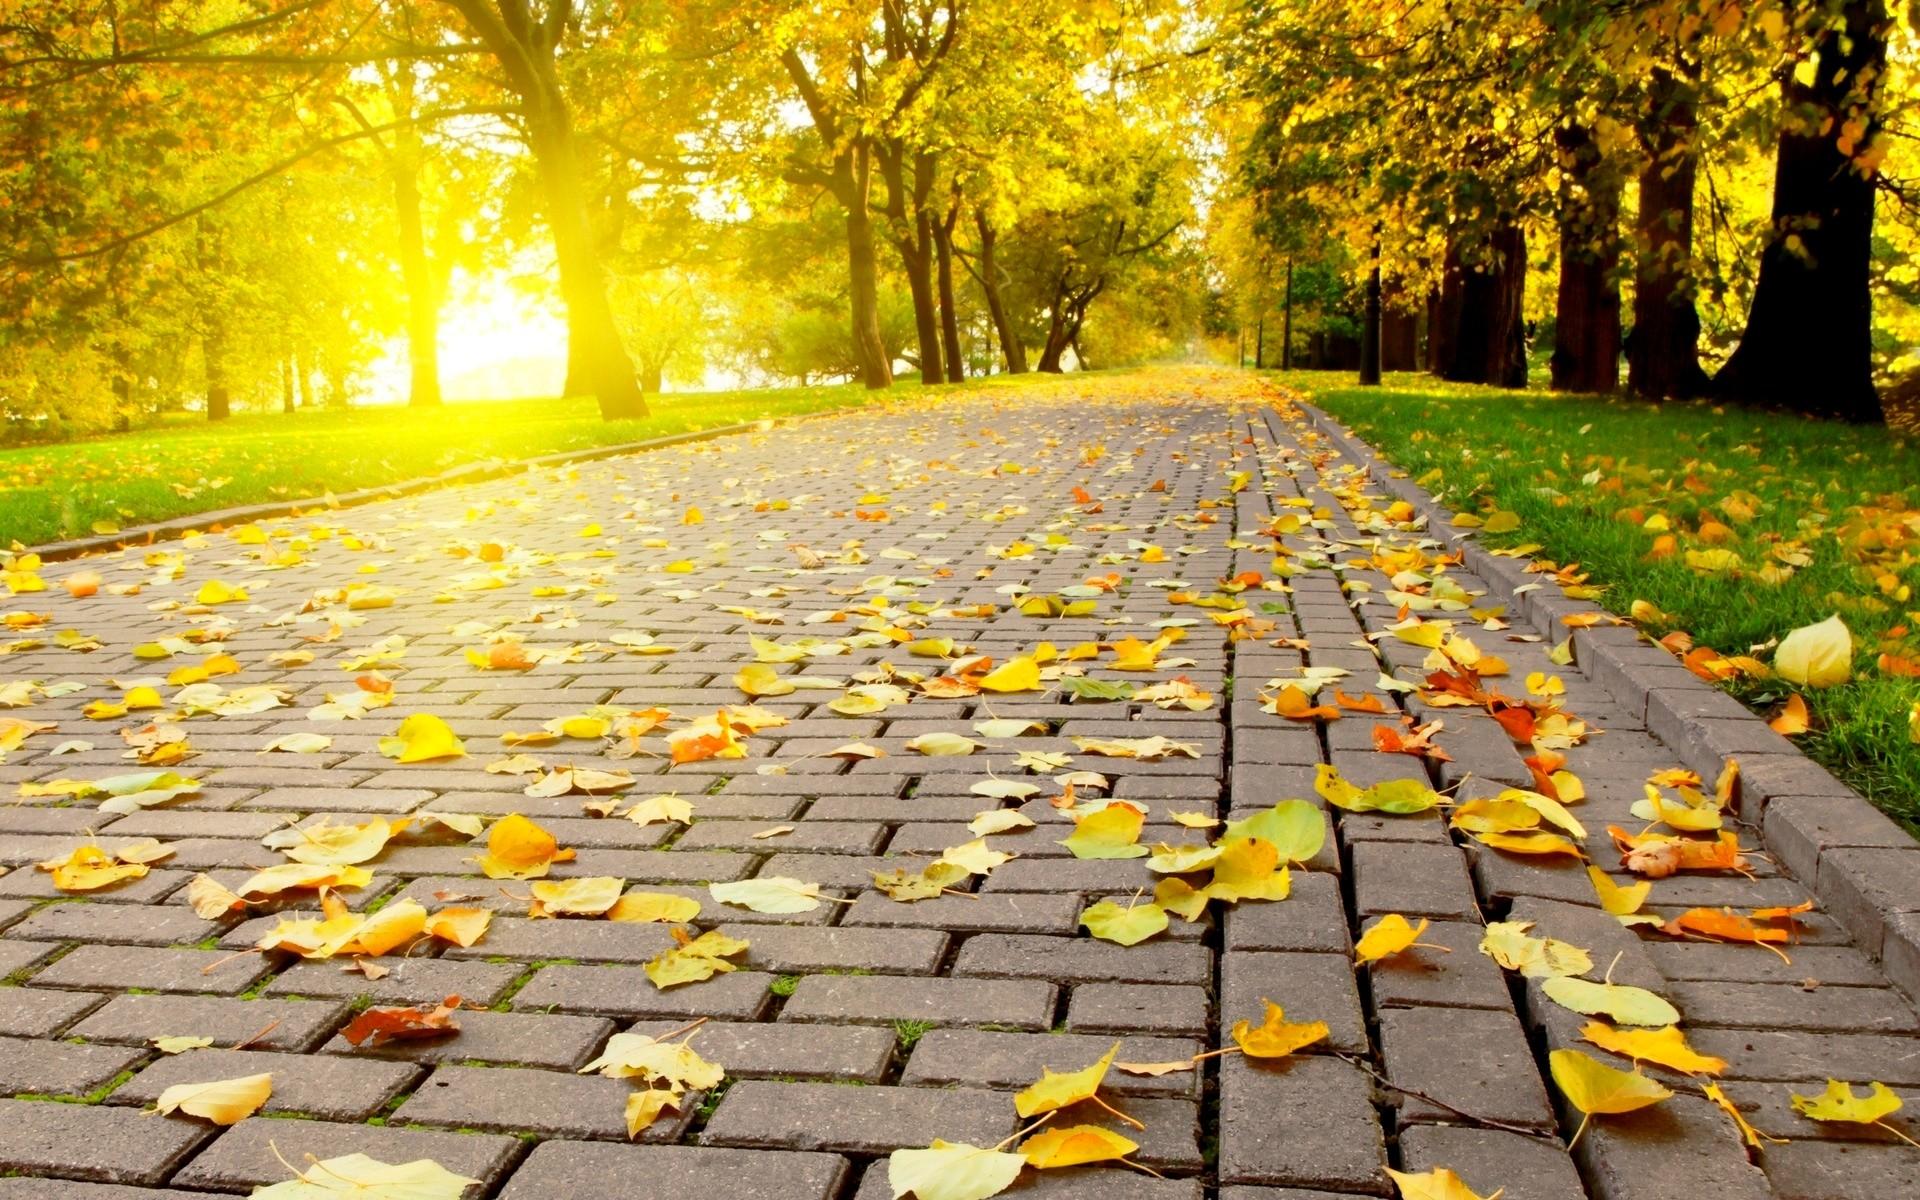 Wallpaper of Autumn Nature – https://whatstrendingonline.com/wallpaper-autumn